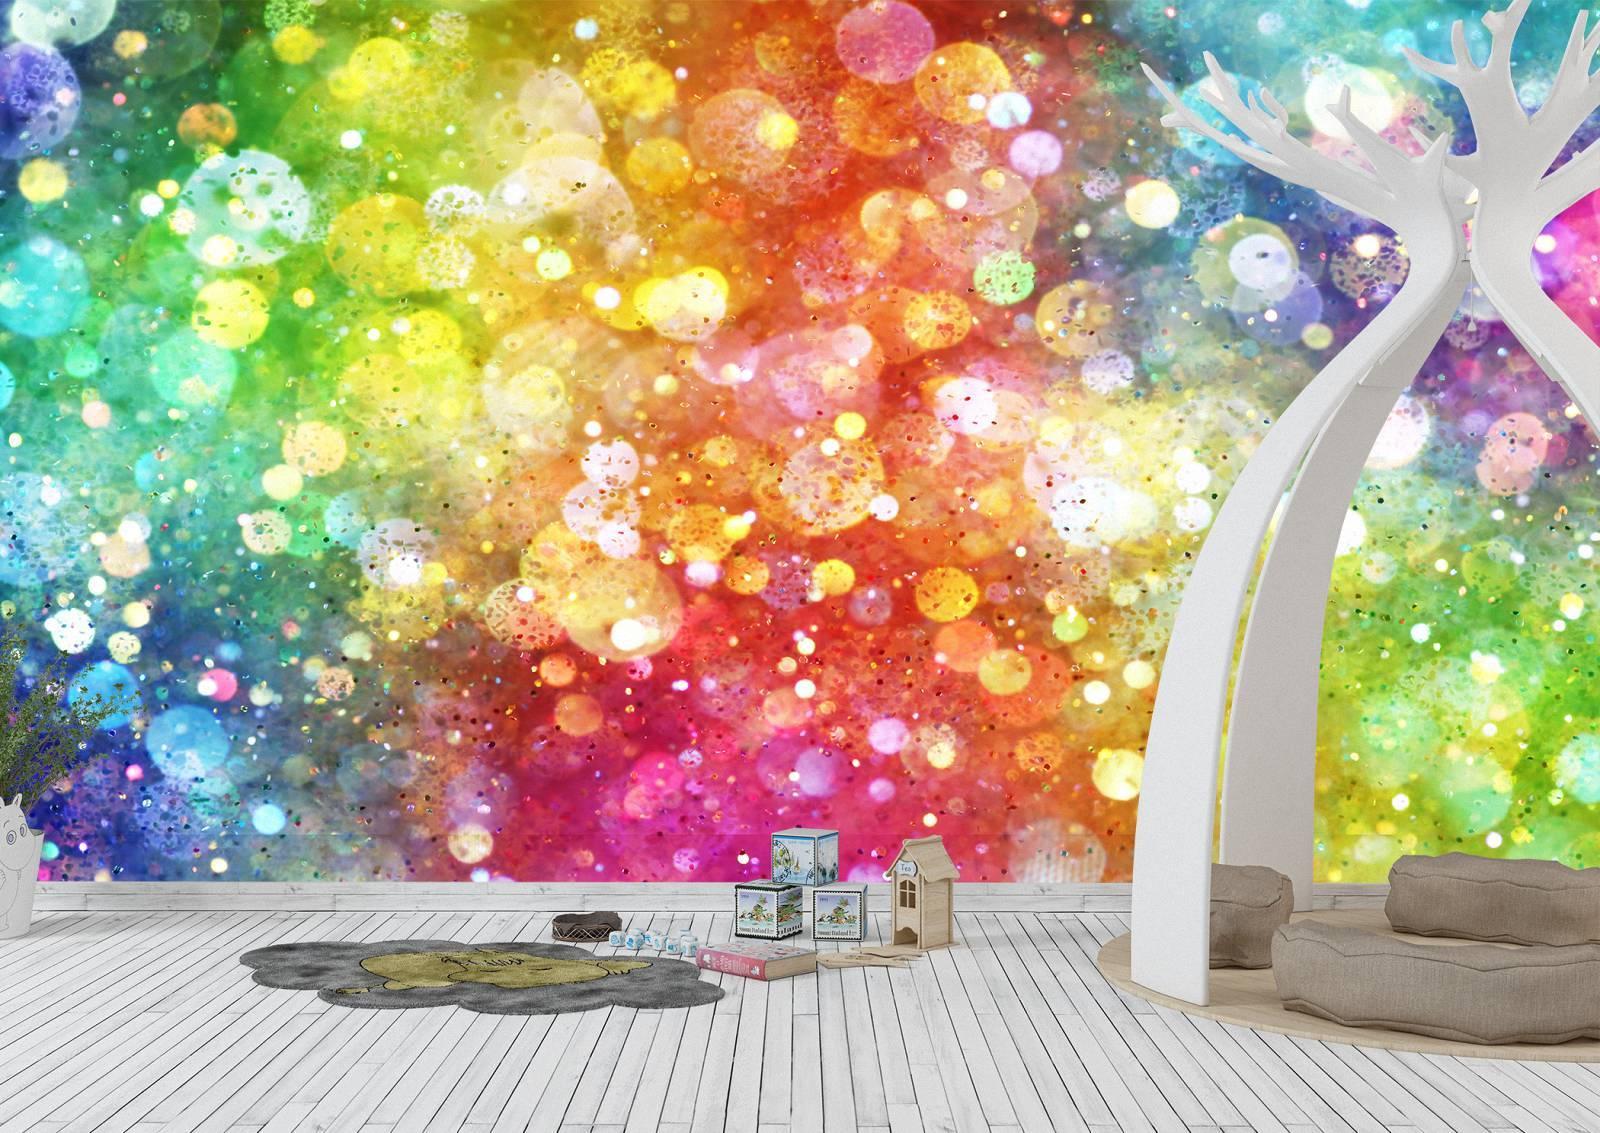 Abstract Rainbow Colours Kids Wall Mural Photo Wallpaper UV Print Decal Art Décor